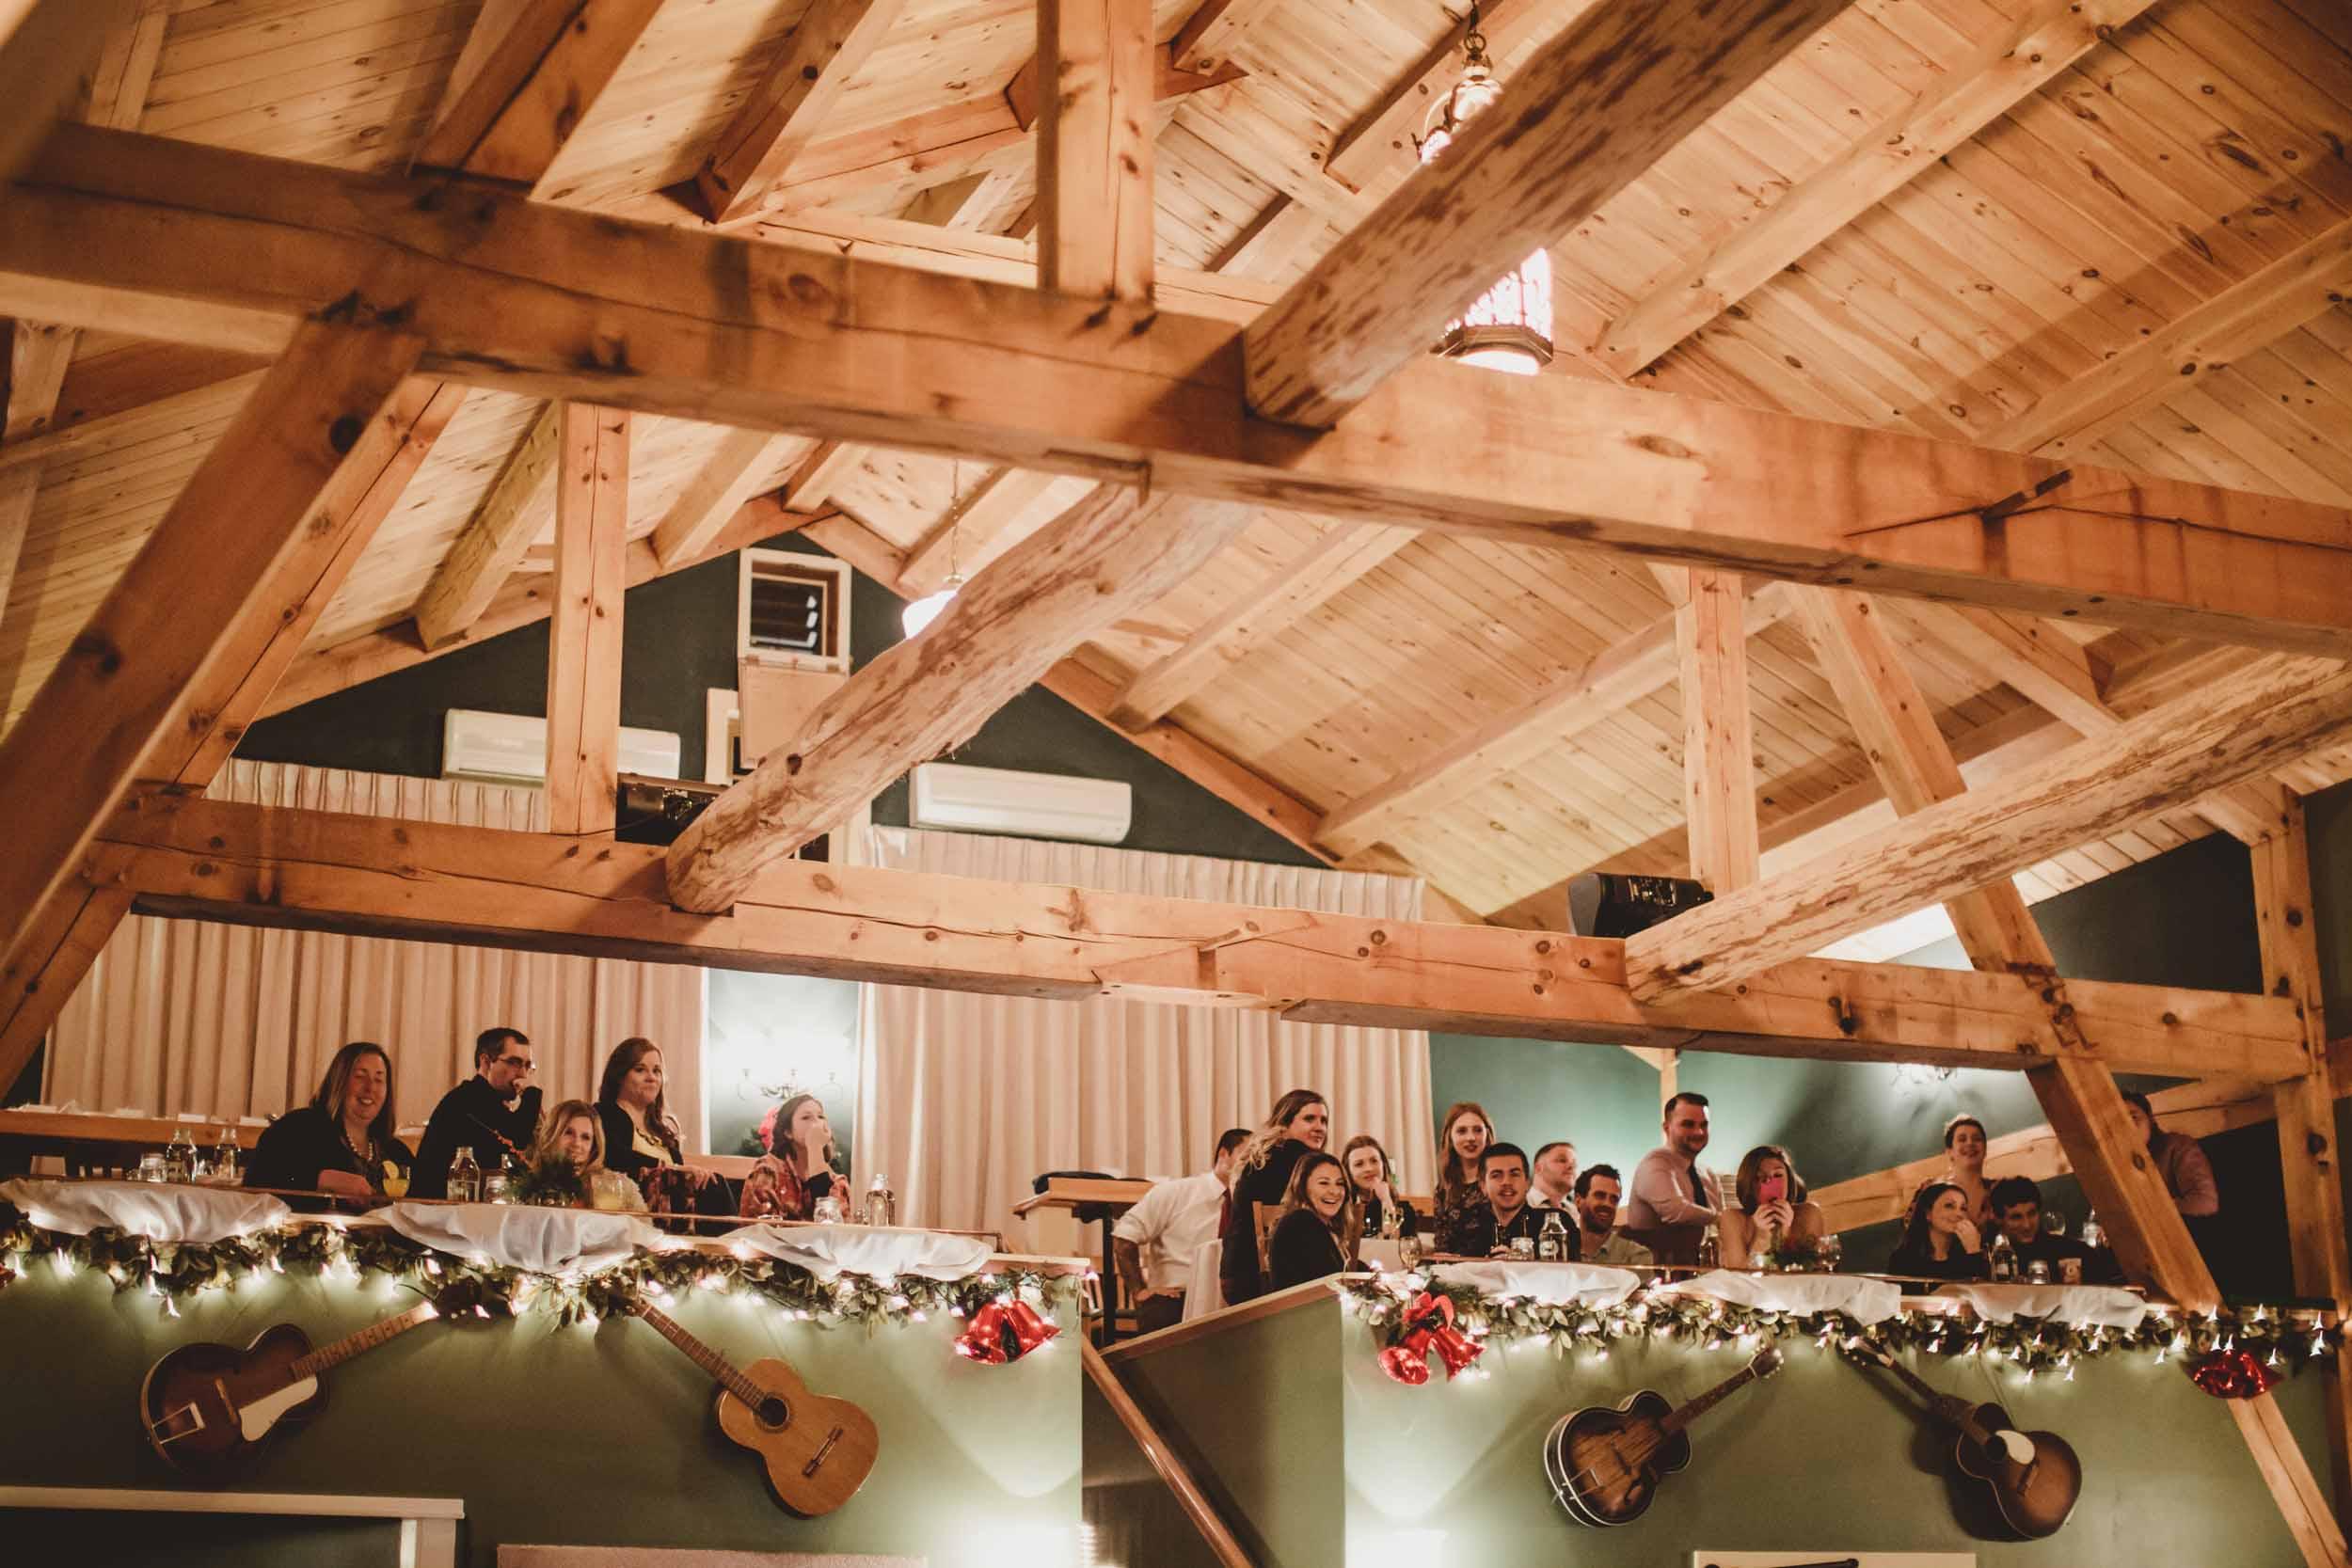 Stone-mountain-arts-wedding74.jpg